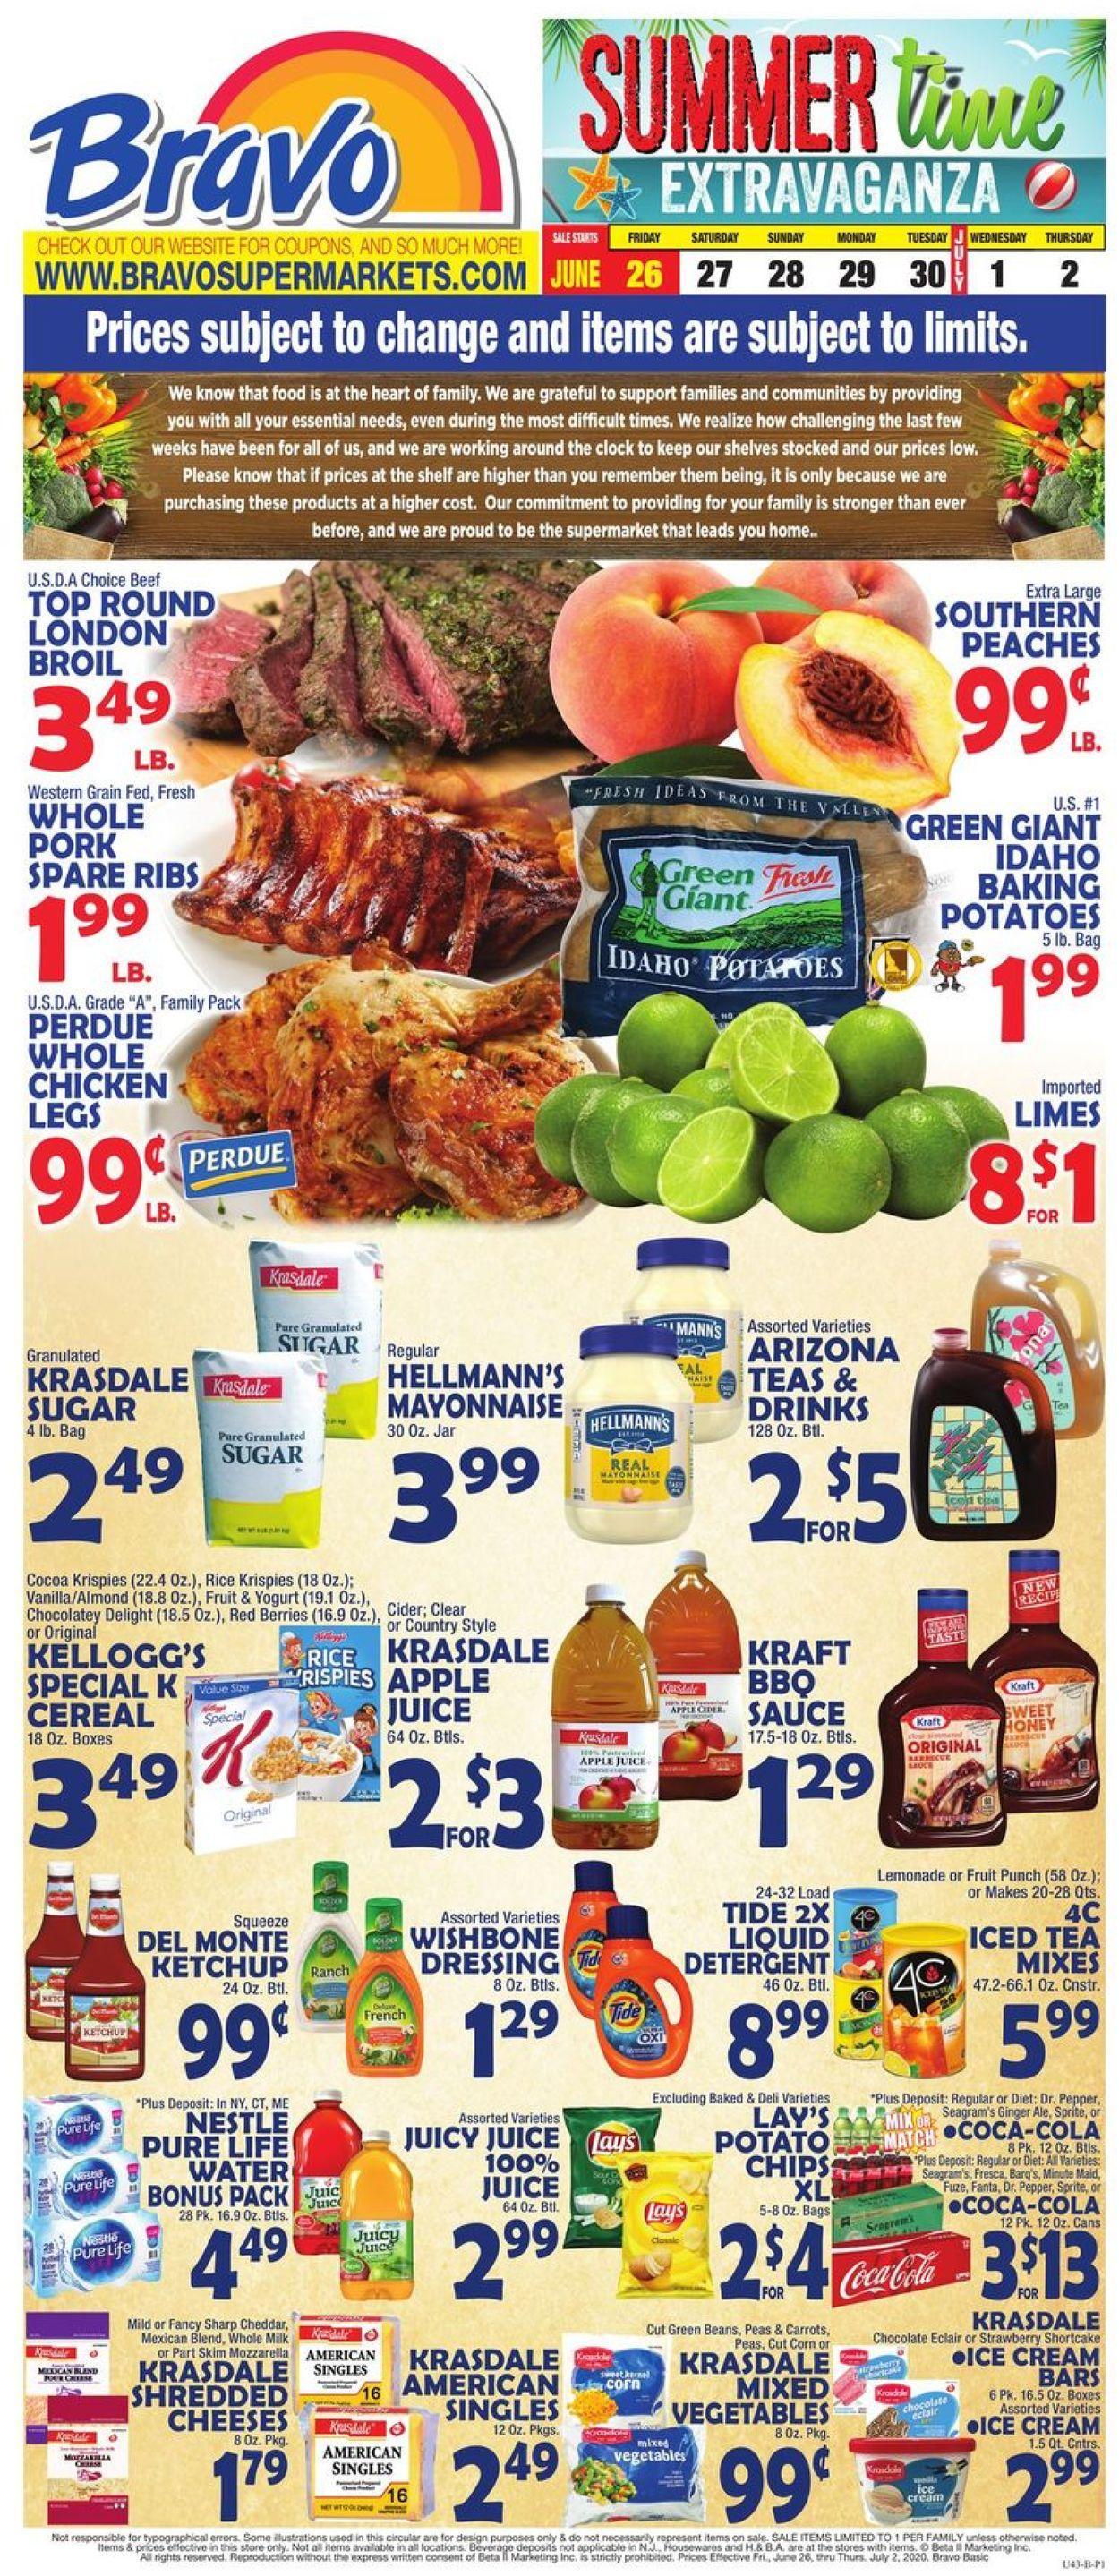 Catalogue Bravo Supermarkets from 06/26/2020